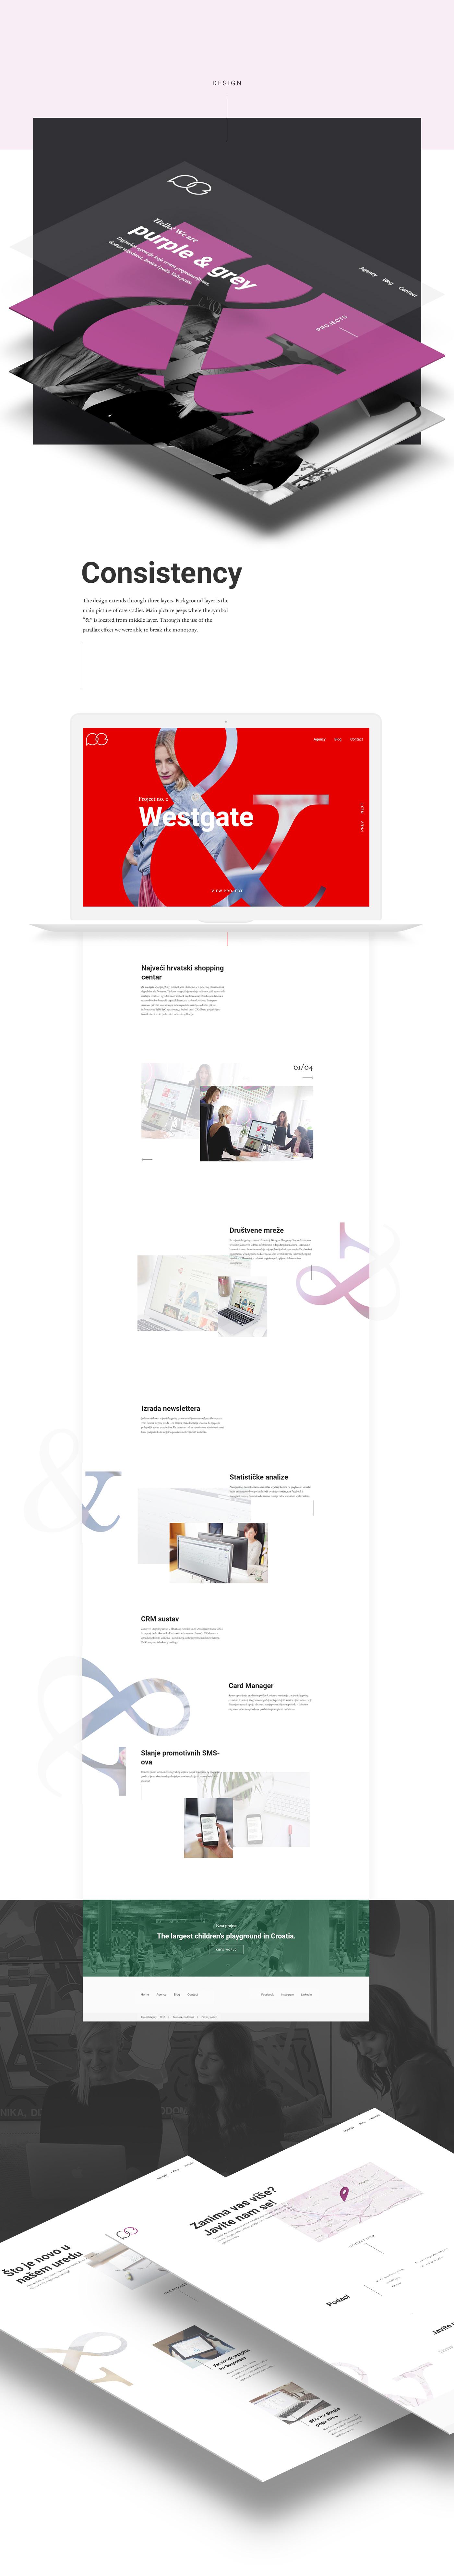 UI,ux,design,Web,Website,Responsive,rwd,mobile,purple,minimal,clean,White,parallax,flat,modern